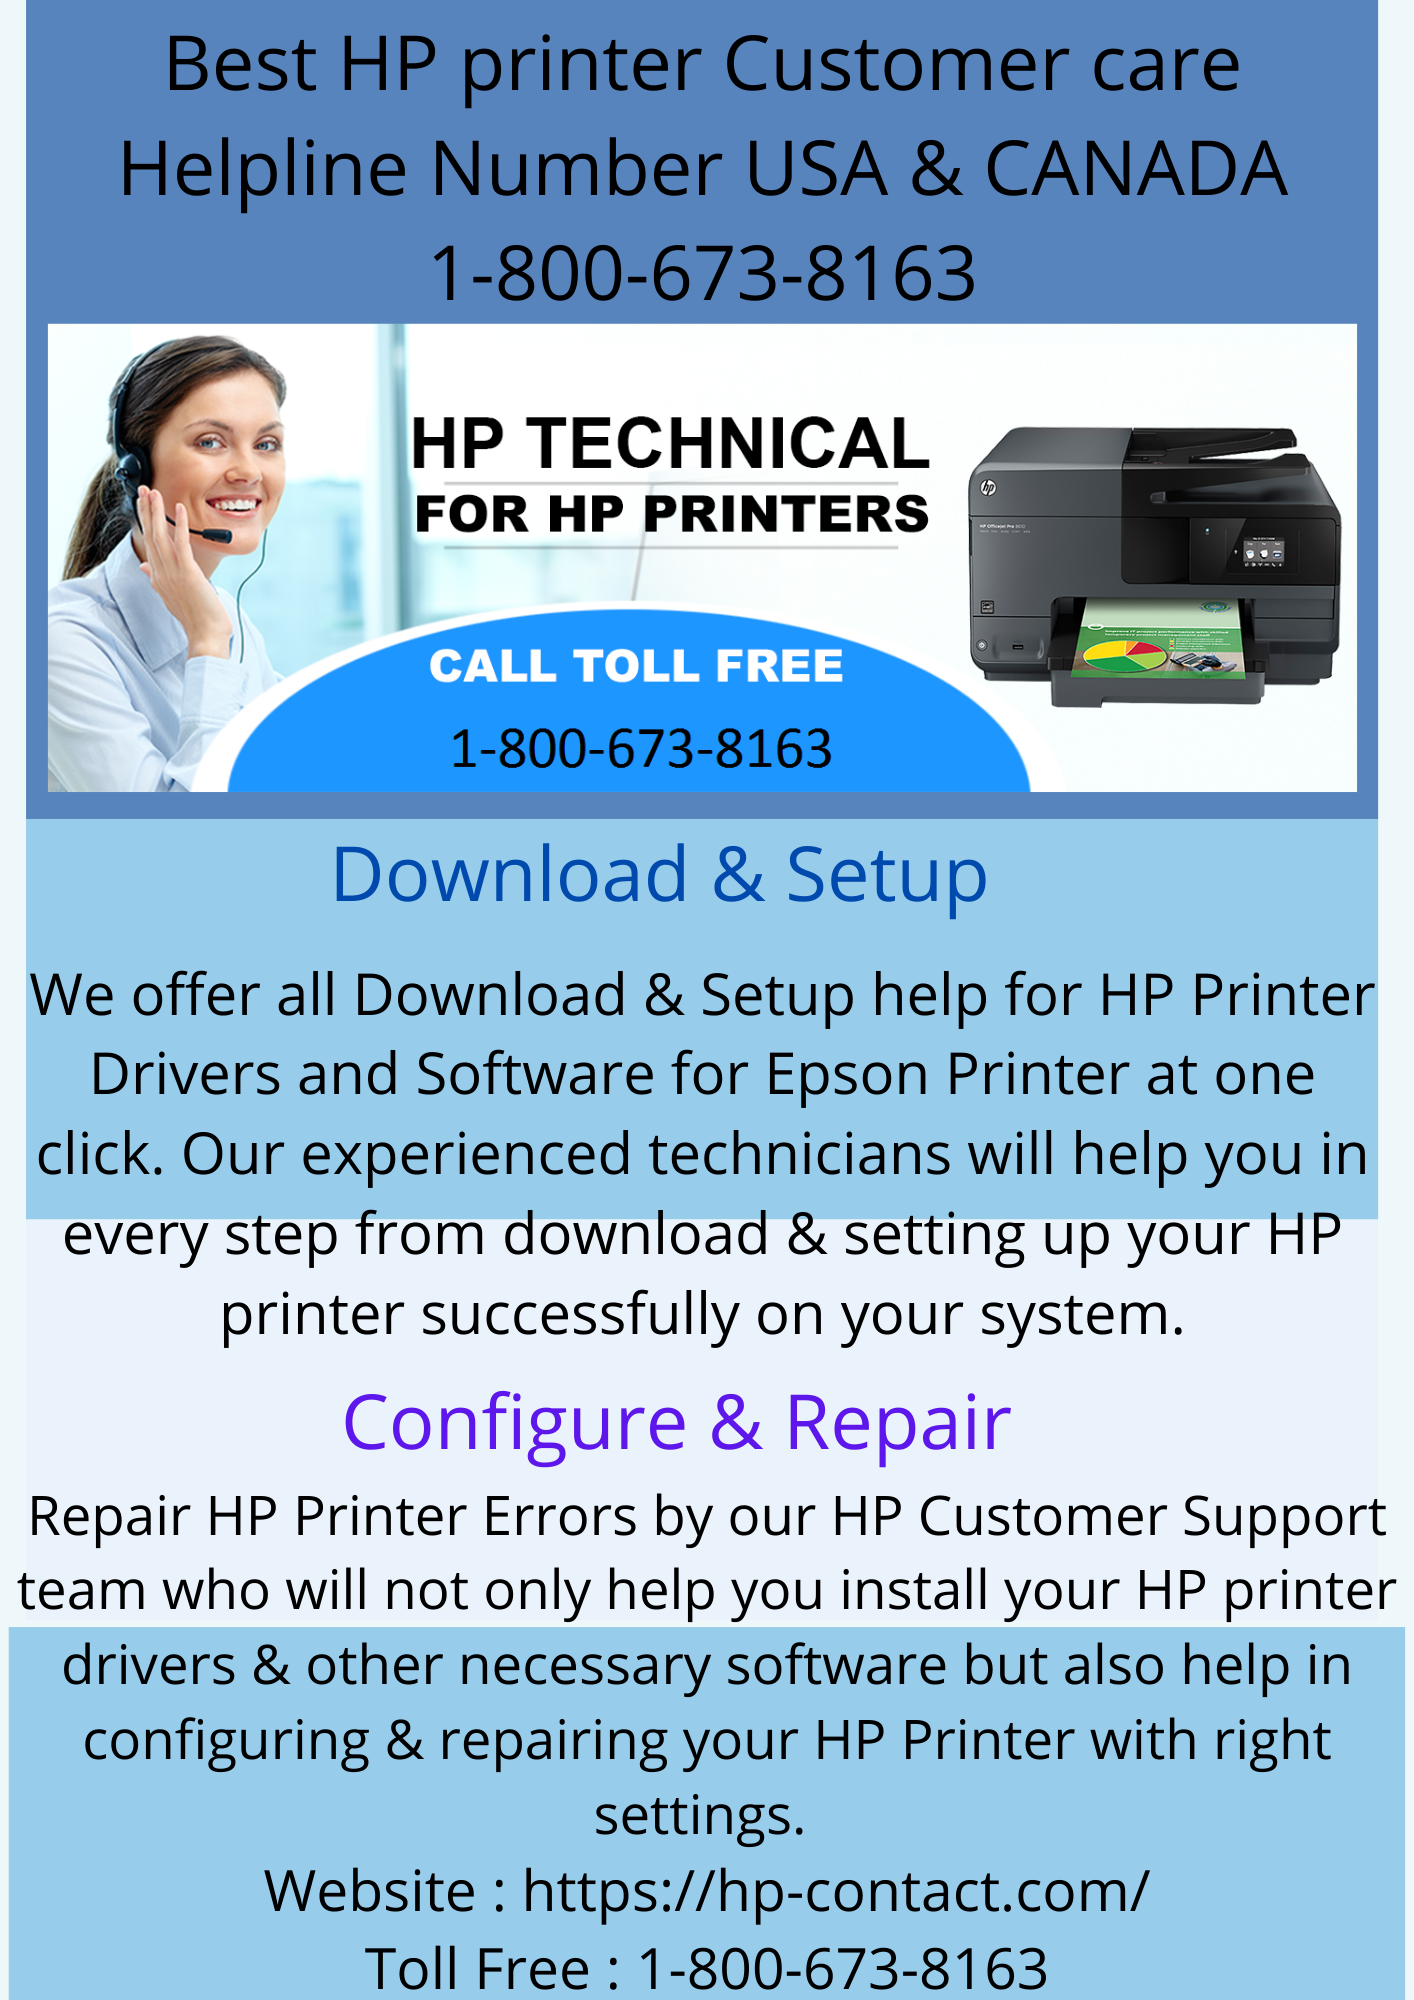 Best HP printer Customer care Helpline Number USA & CANADA 1 800 673 8163